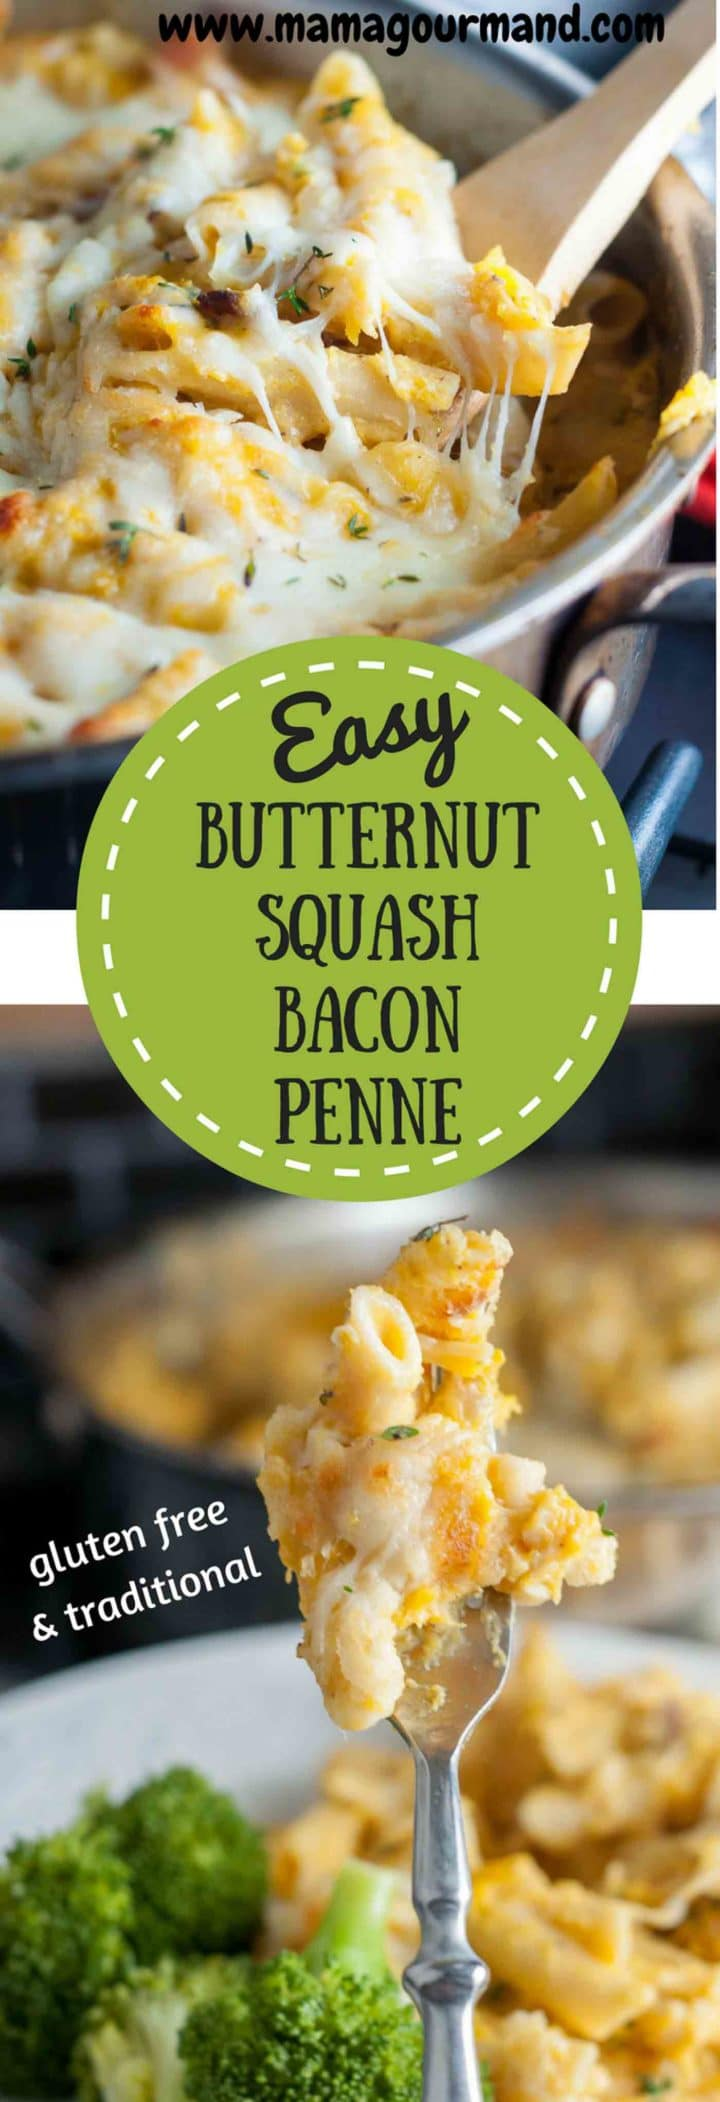 Braised Butternut Squash, Bacon Penne Bake is a creamy pasta bake tossed in a creamy butternut squash, bacon sauce. #butternutsquash #bacon #pasta #weeknightdinner #comfort food #glutenfreepasta https://www.mamagourmand.com